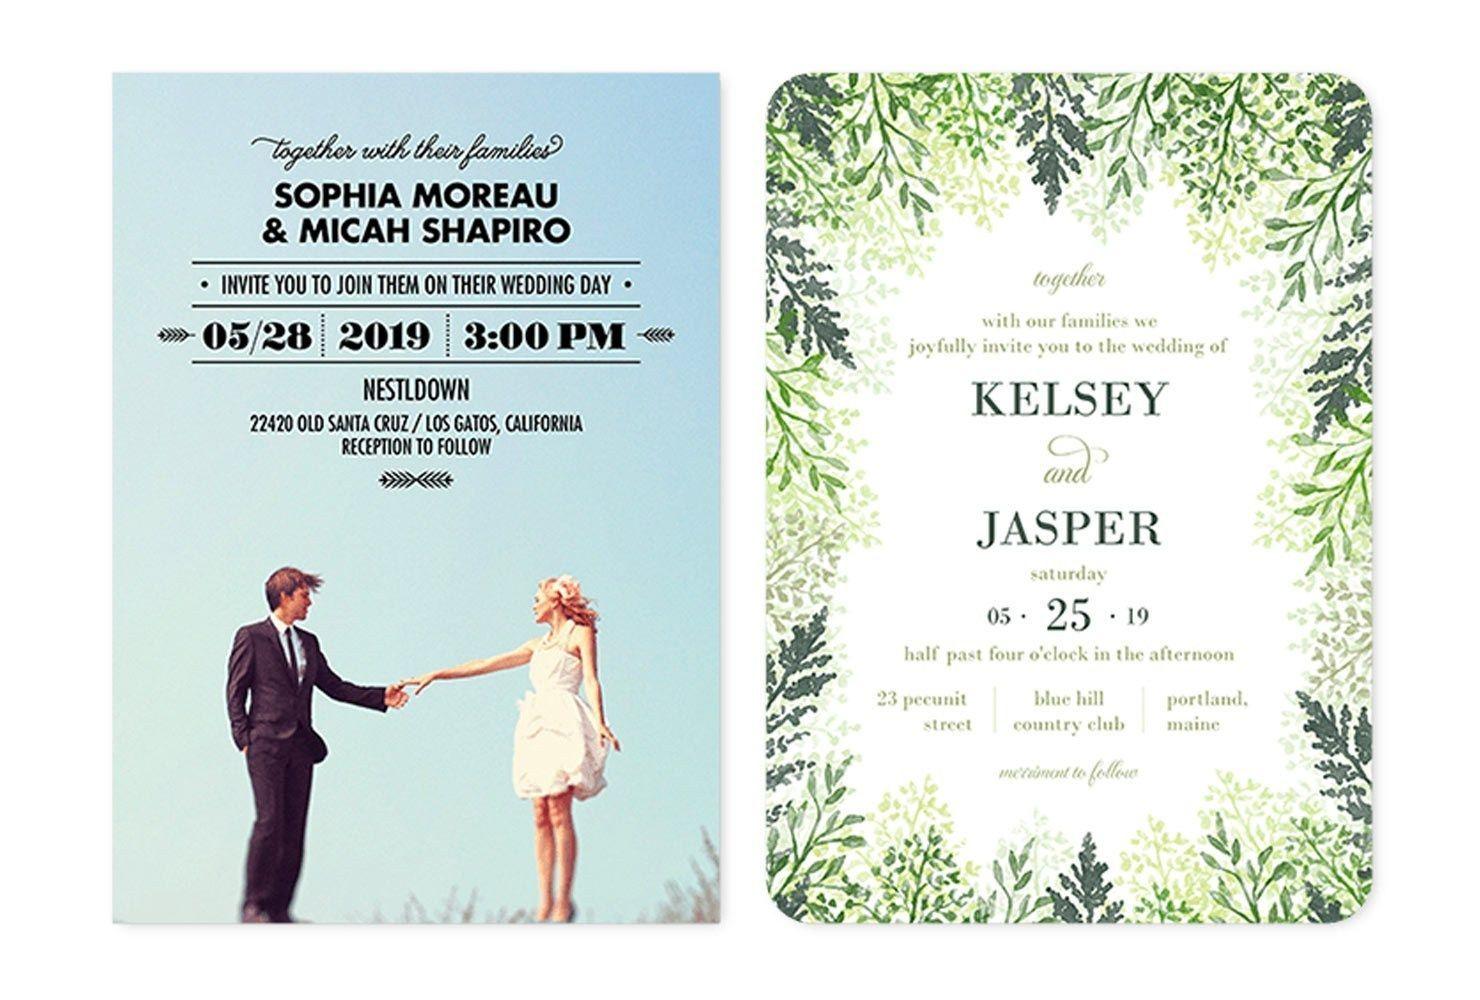 5 Beautiful Wedding Invitation Wording Samples No Gifts